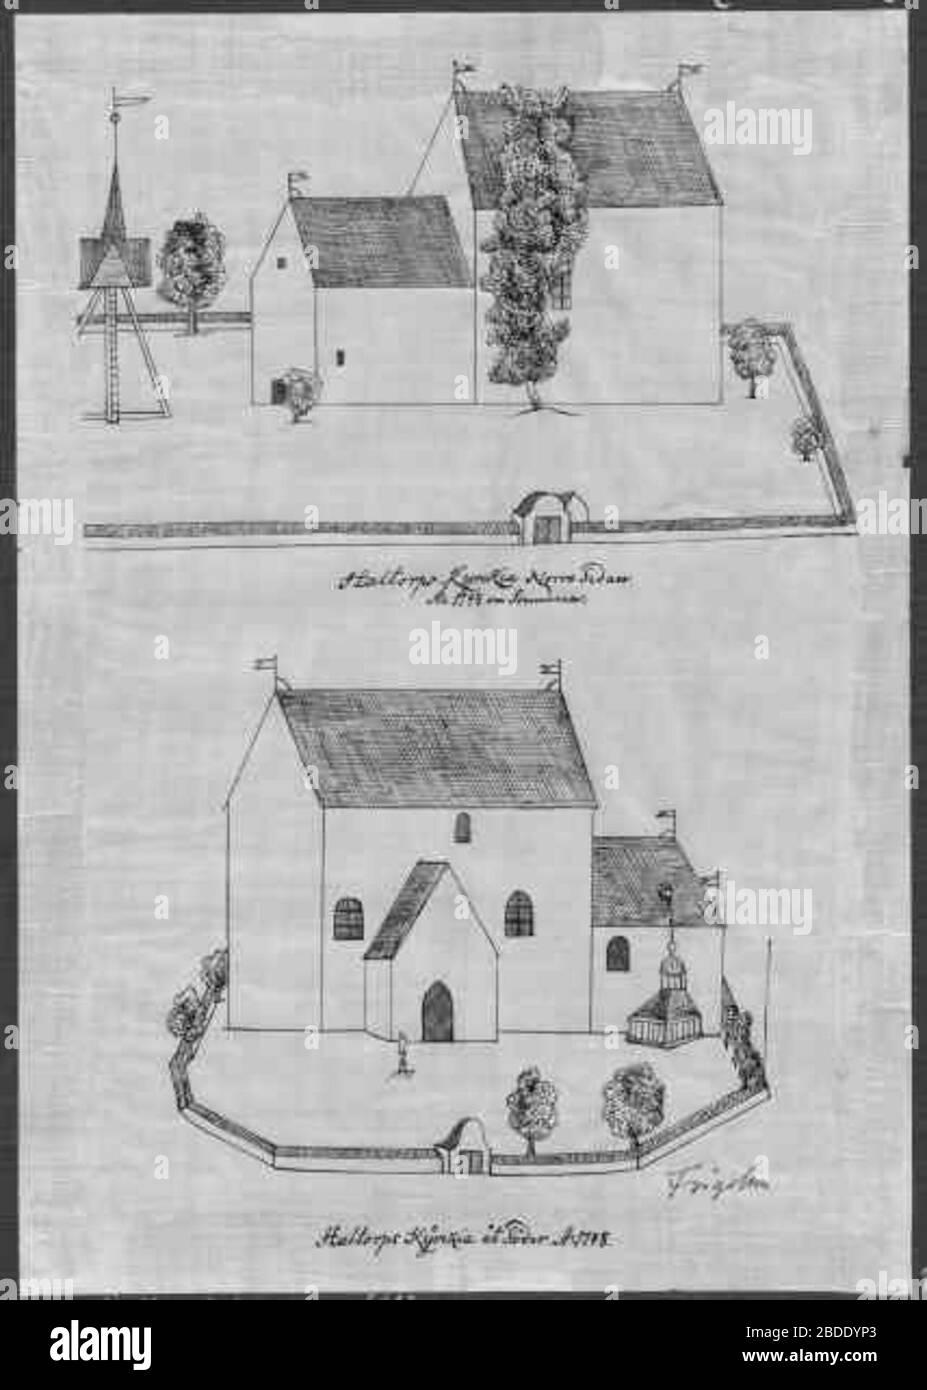 Helena Johansdotter (1677 - 1751) - Genealogy - Geni